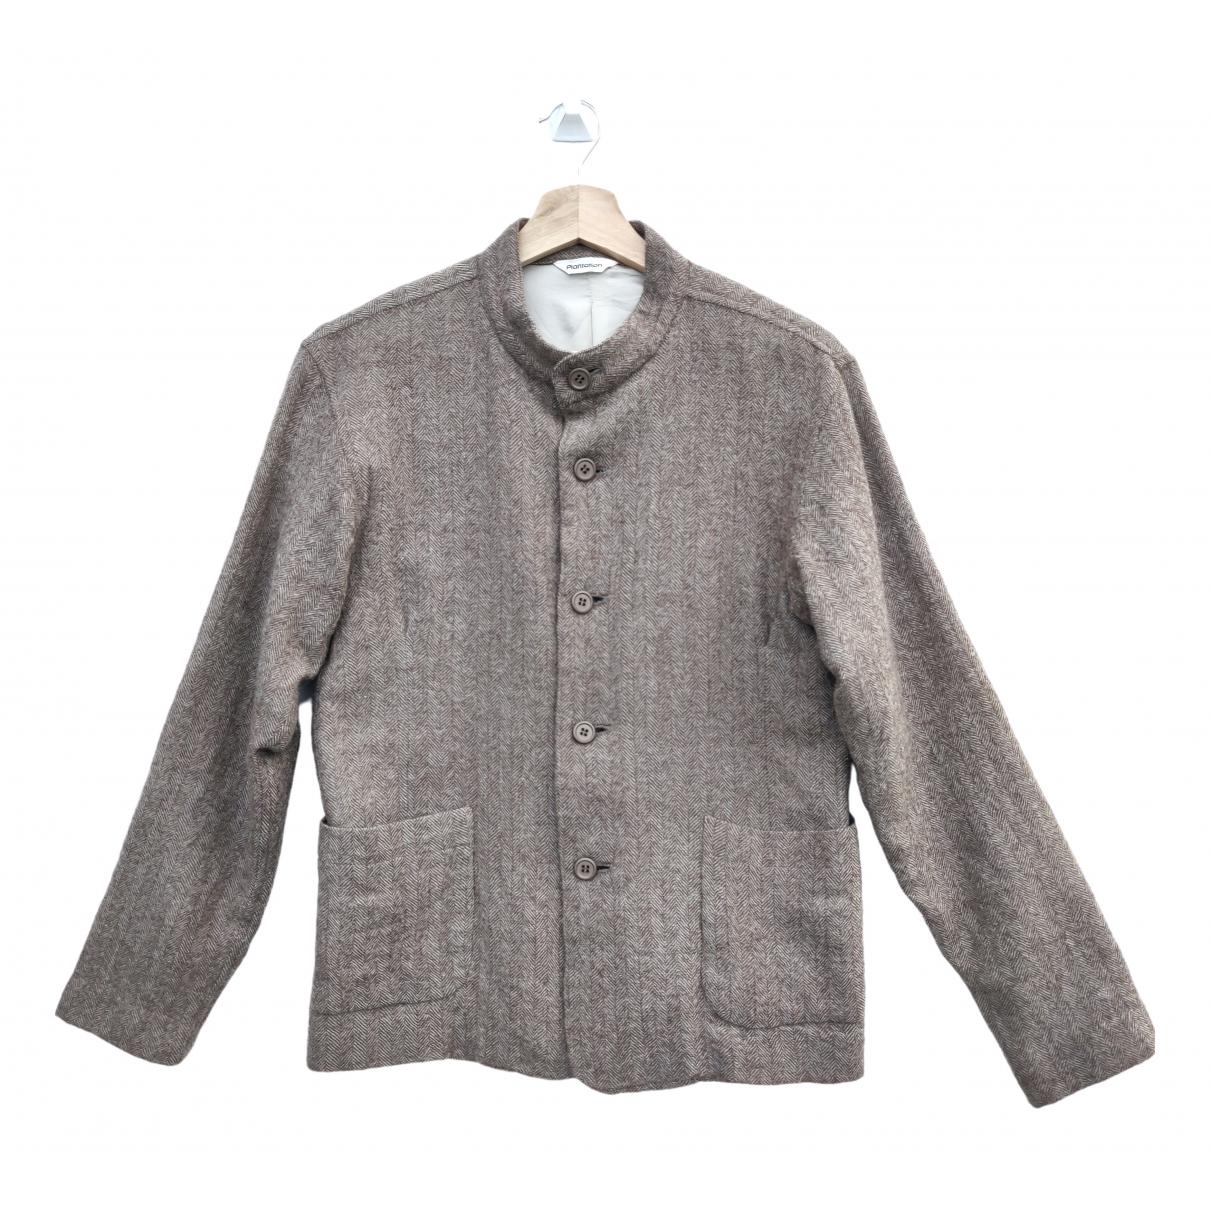 Issey Miyake \N Brown Wool jacket for Women M International